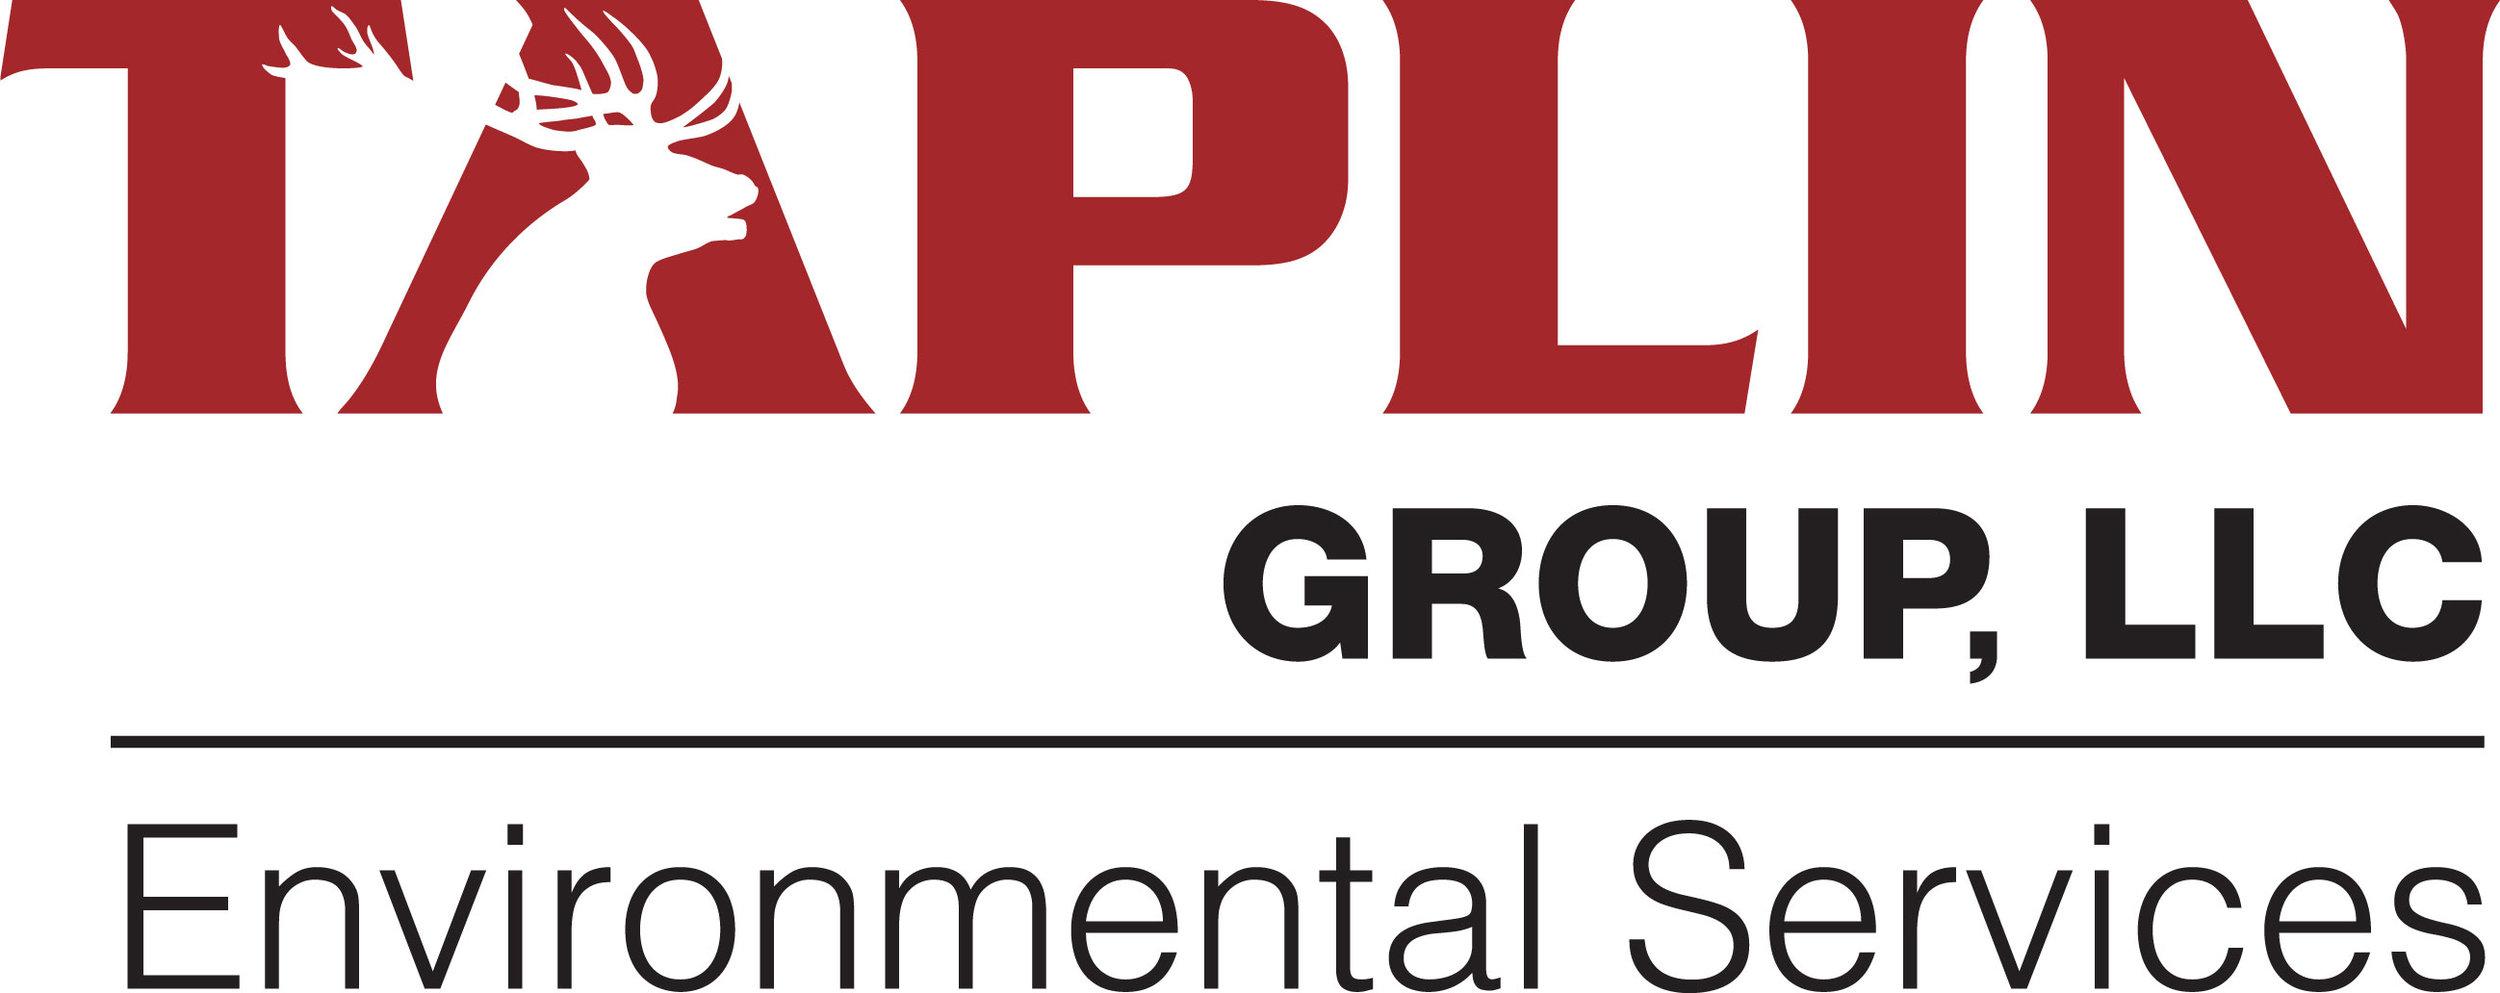 Taplin_logo_Group_high res.red.jpg